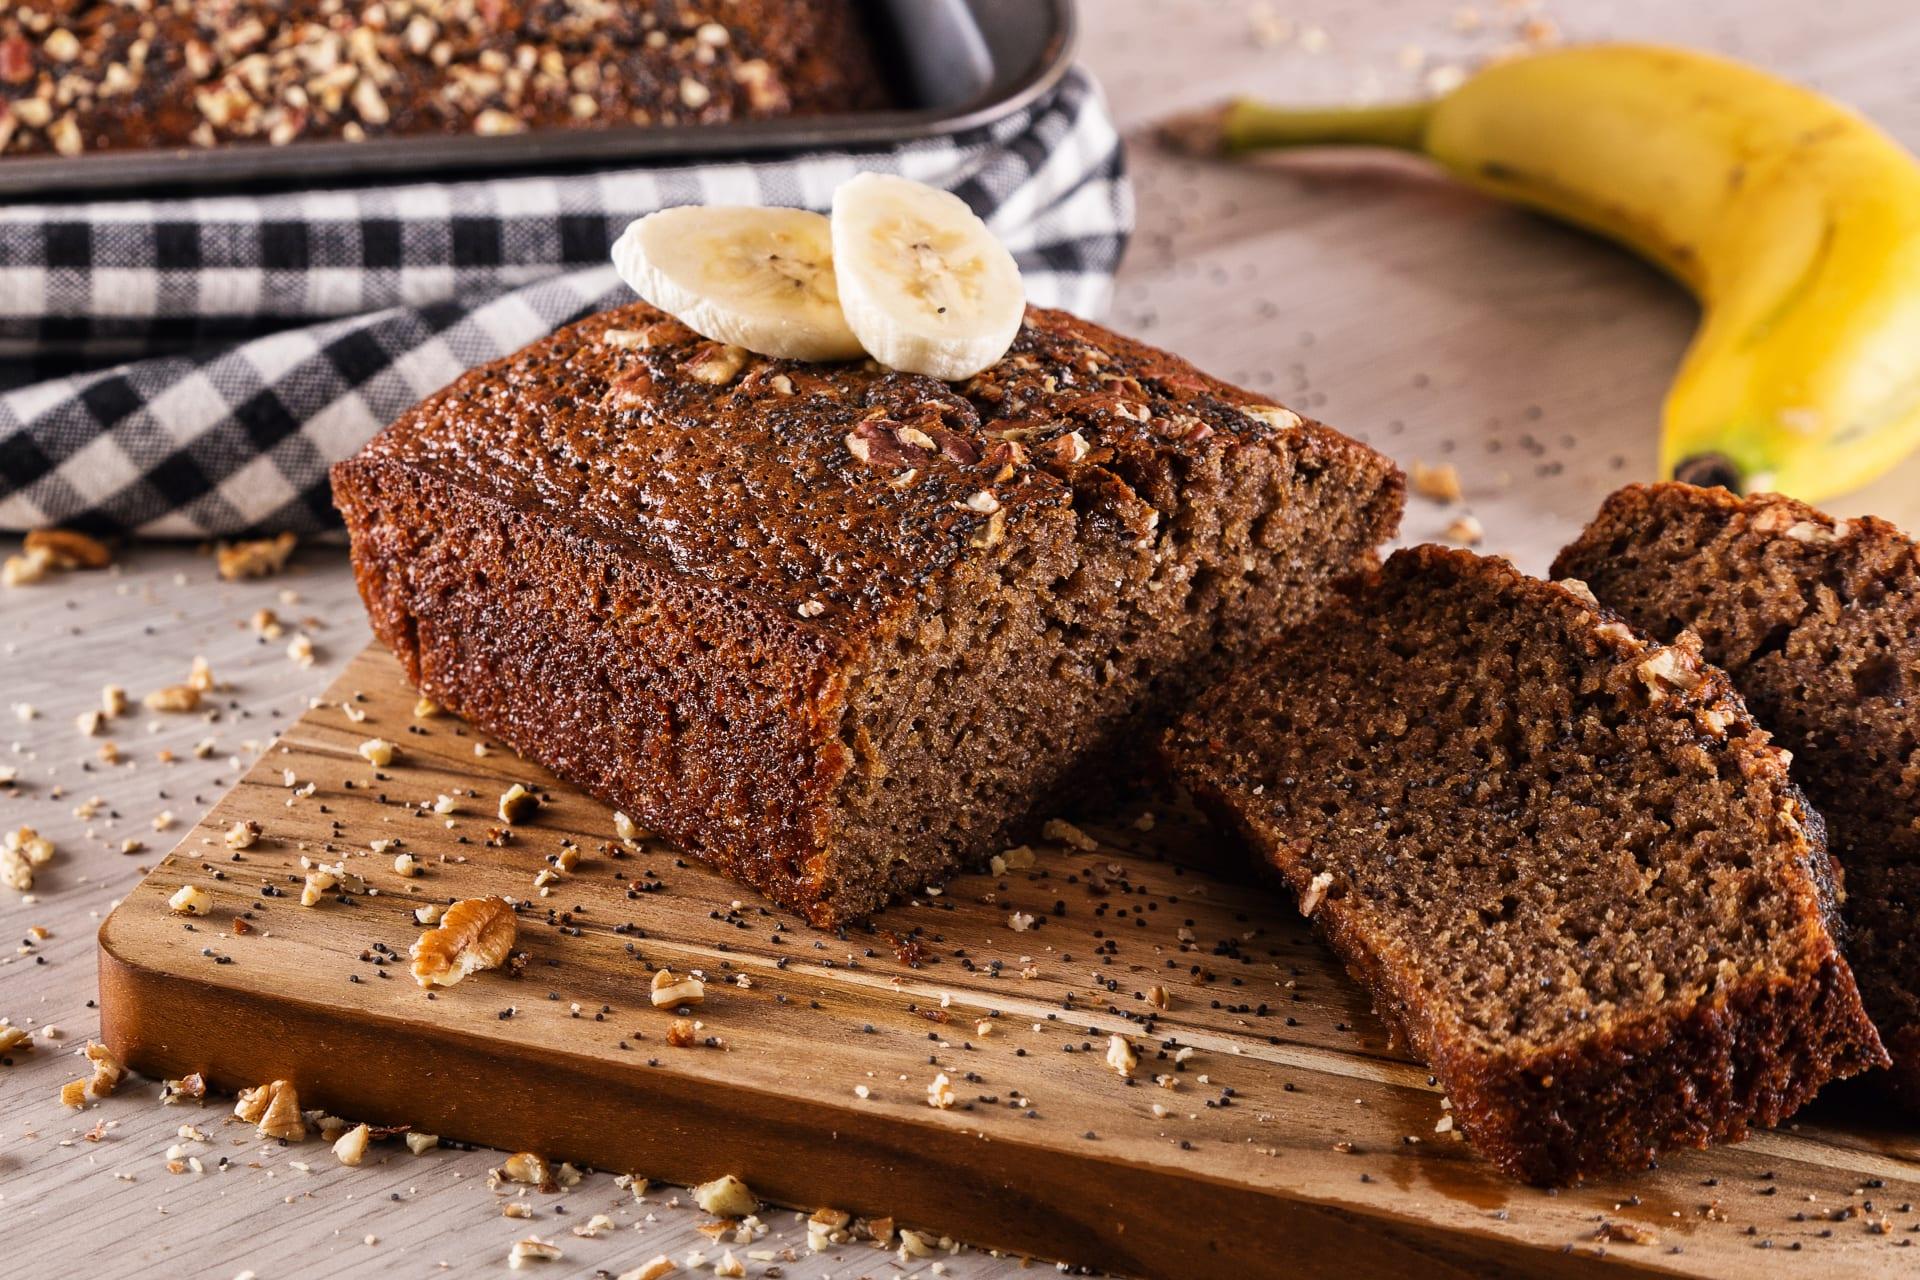 Kerala - Banana Cake (Cooking)